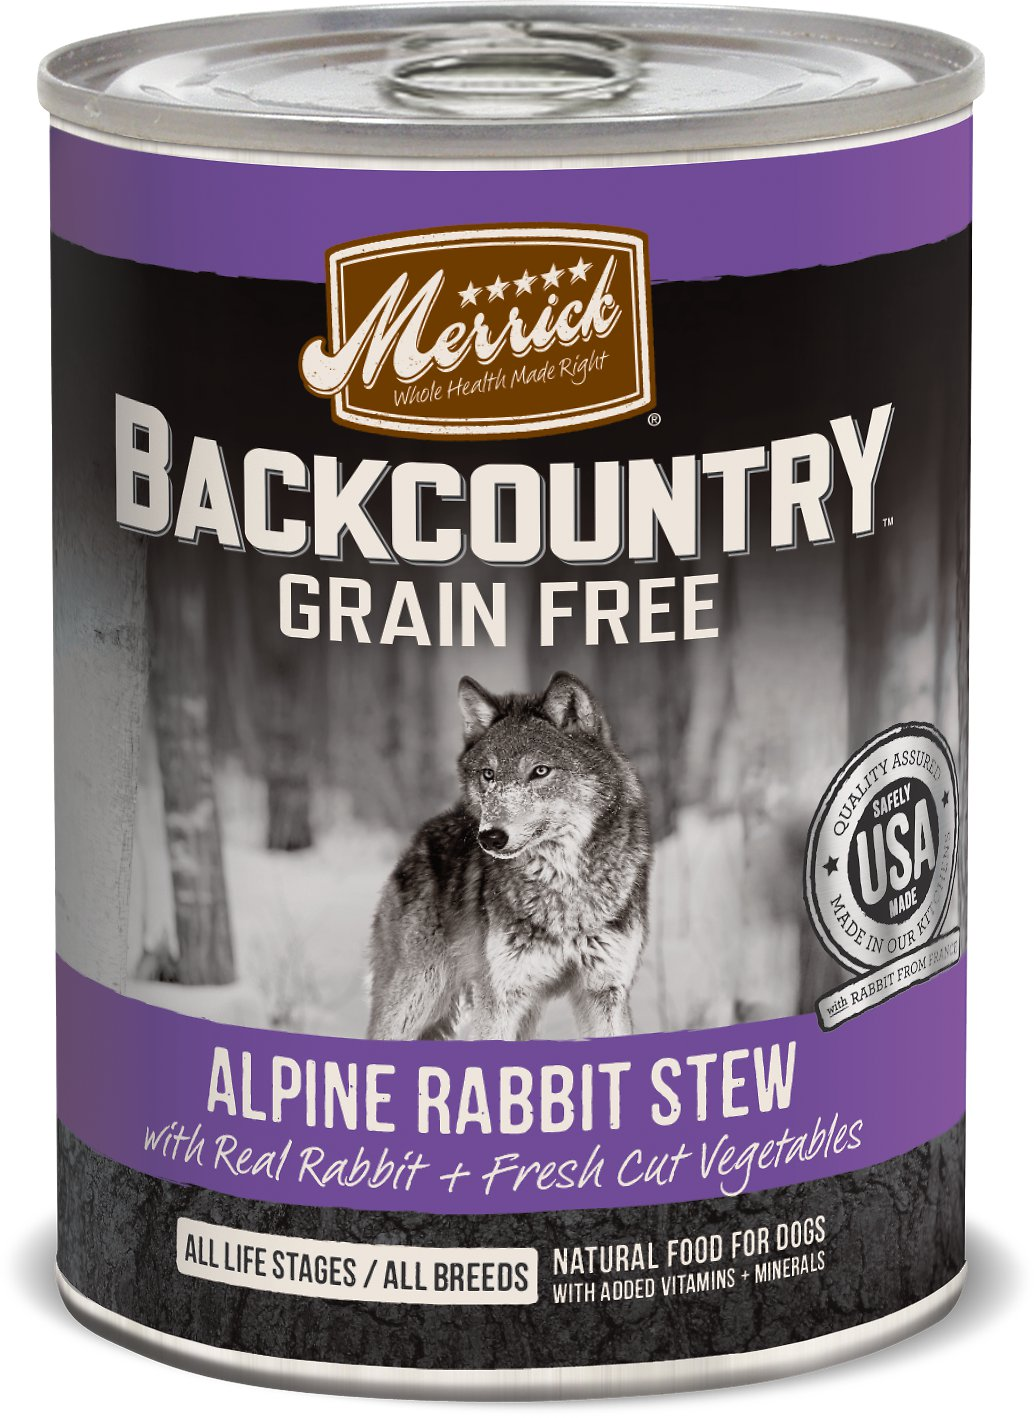 Merrick Backcountry Alpine Rabbit Stew Canned Dog Food 12.7z, 12